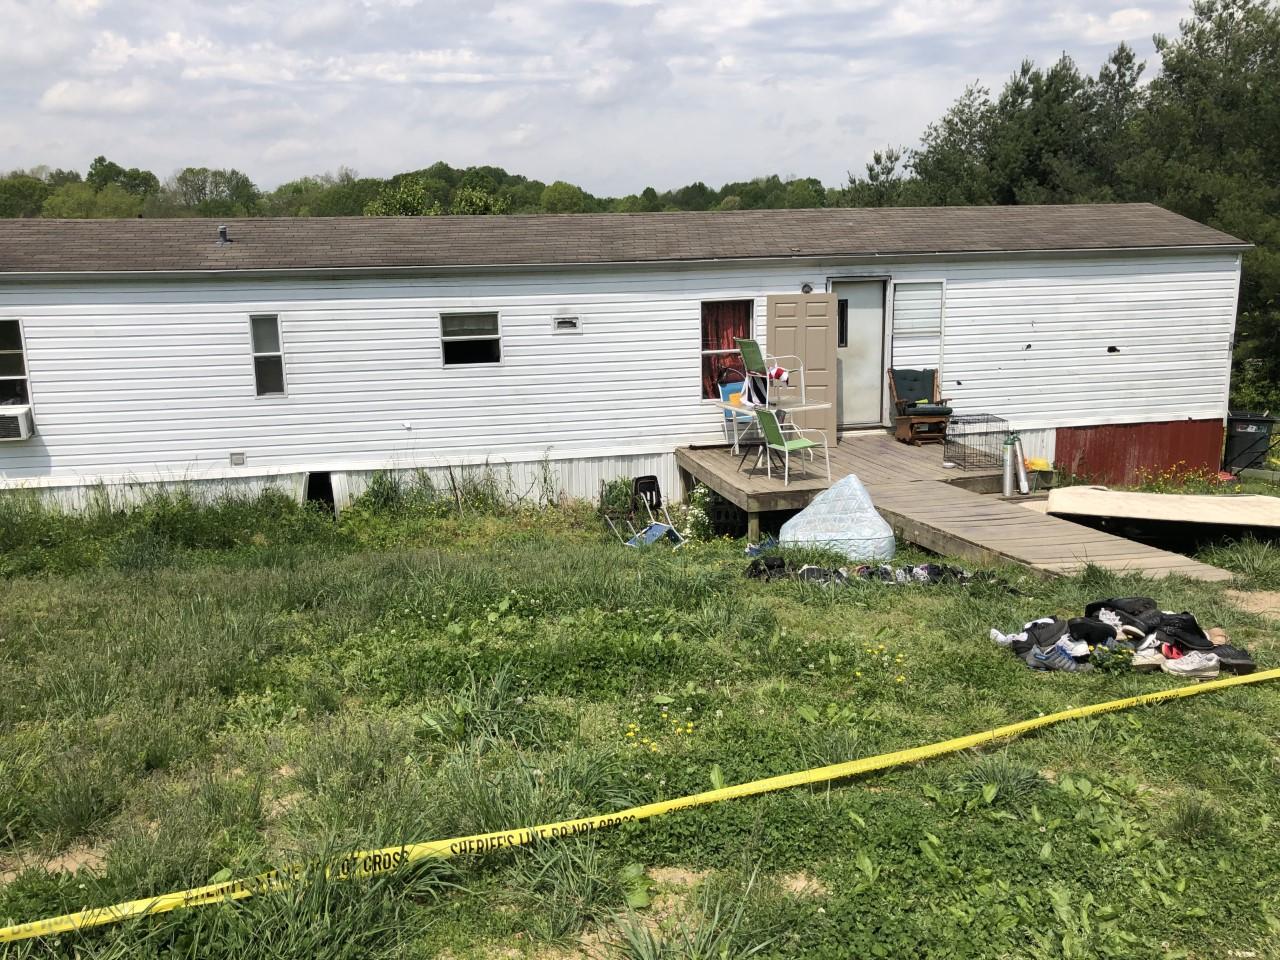 Sumner county homicides house_1556575232639.jpg-873703986.jpg